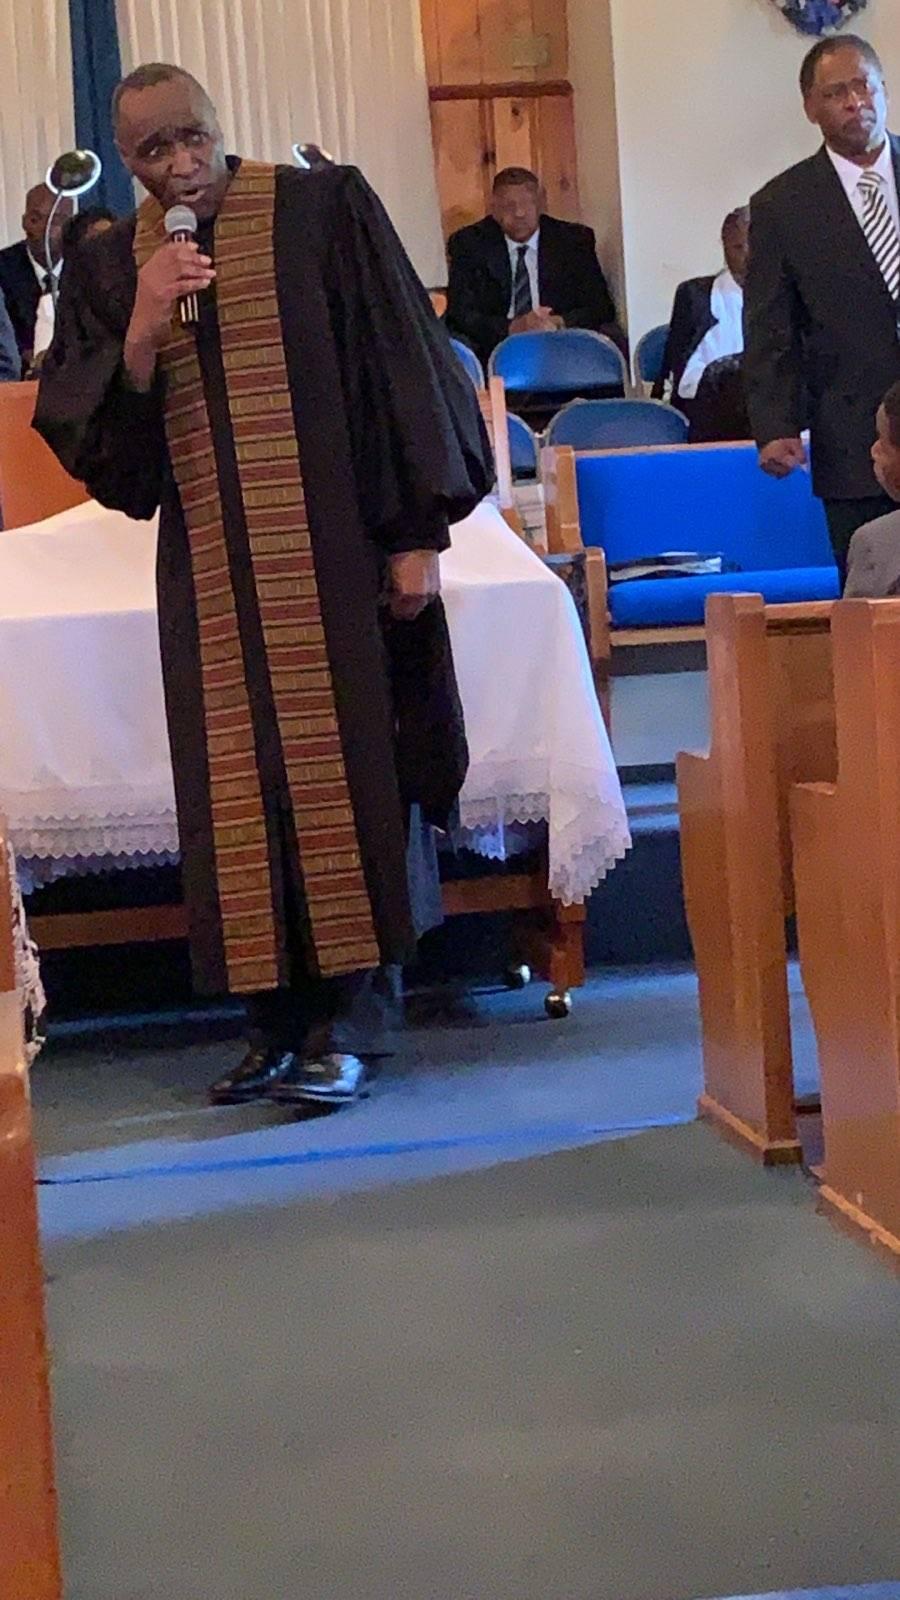 Mt Sinai Baptist Church - church    Photo 2 of 9   Address: 1249 Leboeuf St, New Orleans, LA 70114, USA   Phone: (504) 366-7643